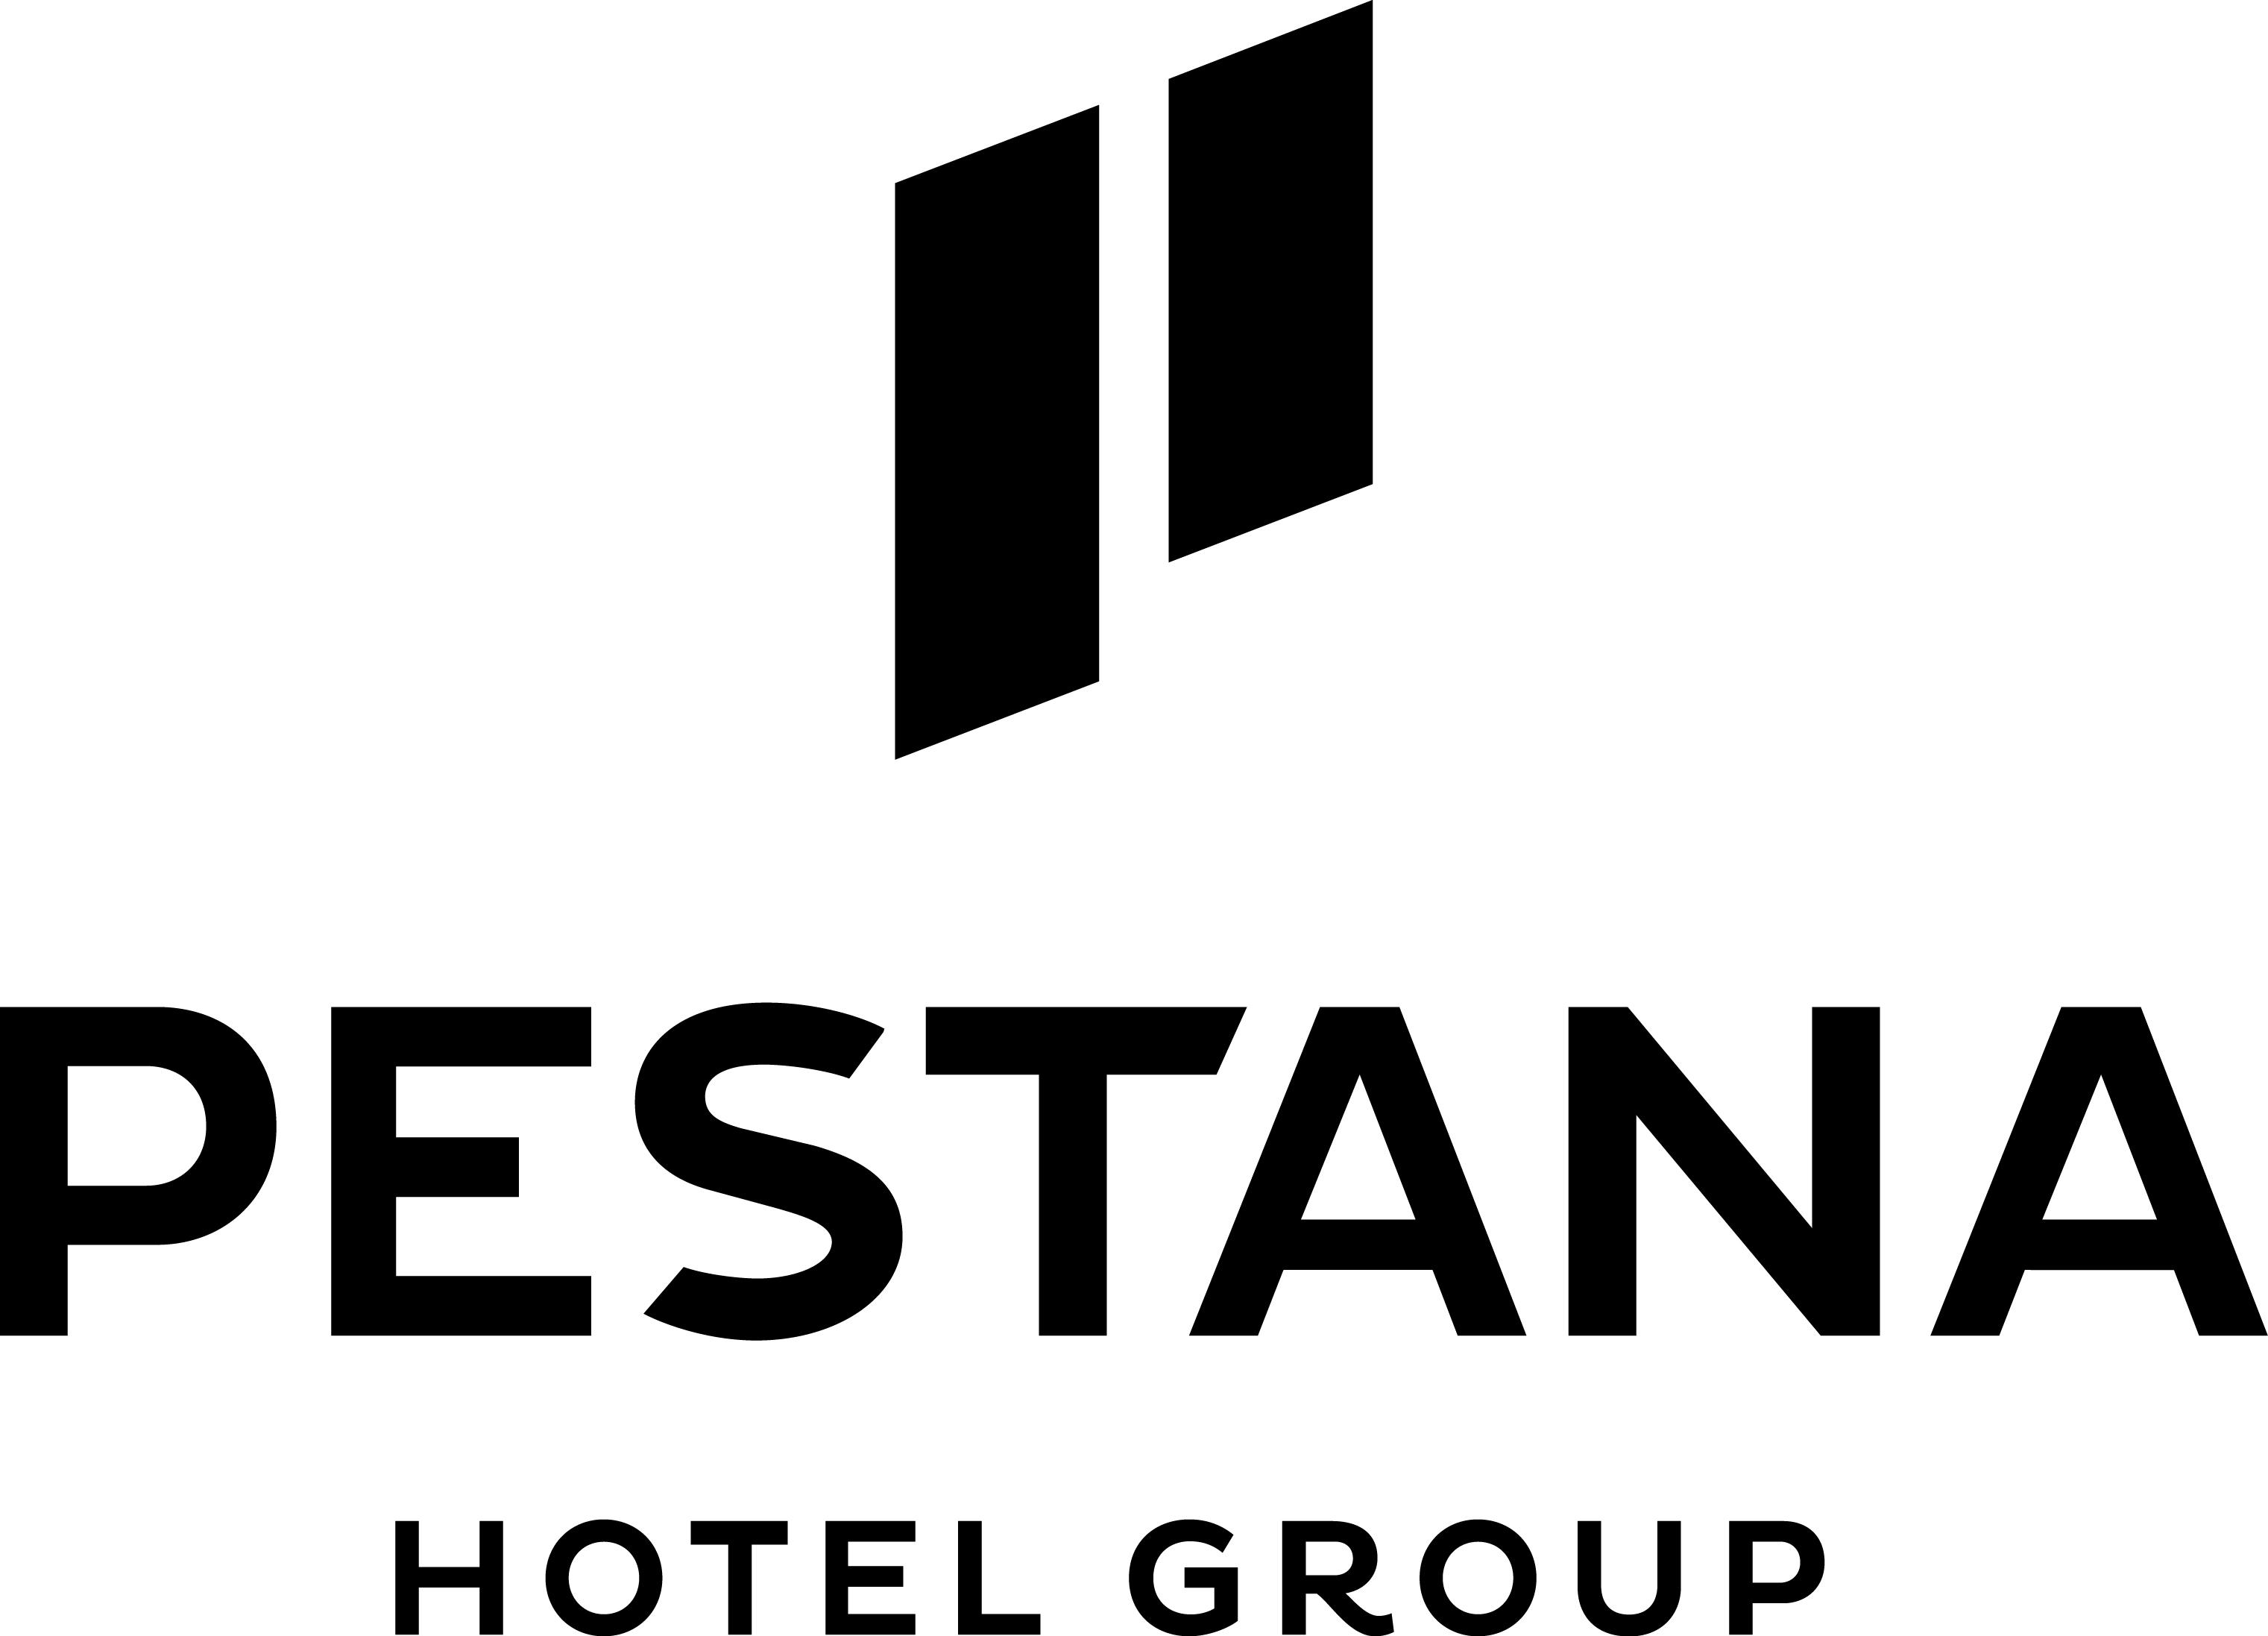 PESTANA HOTEL GROUP - RGB BLACK JPEG.jpg